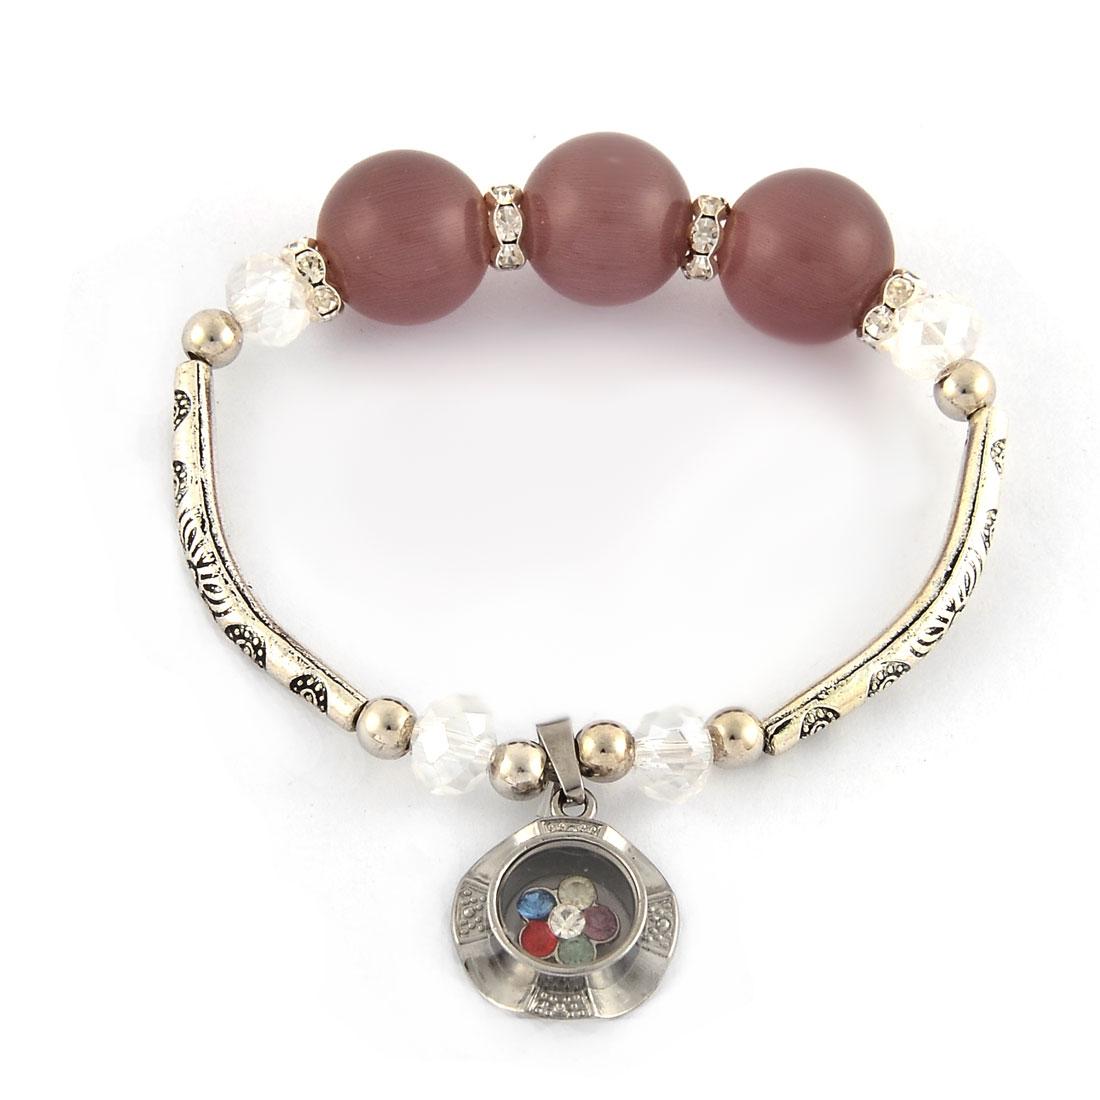 Rhinestone Inlaid Pendant Elastic Bead Chain Wrist Bracelet Bangle Light Purple